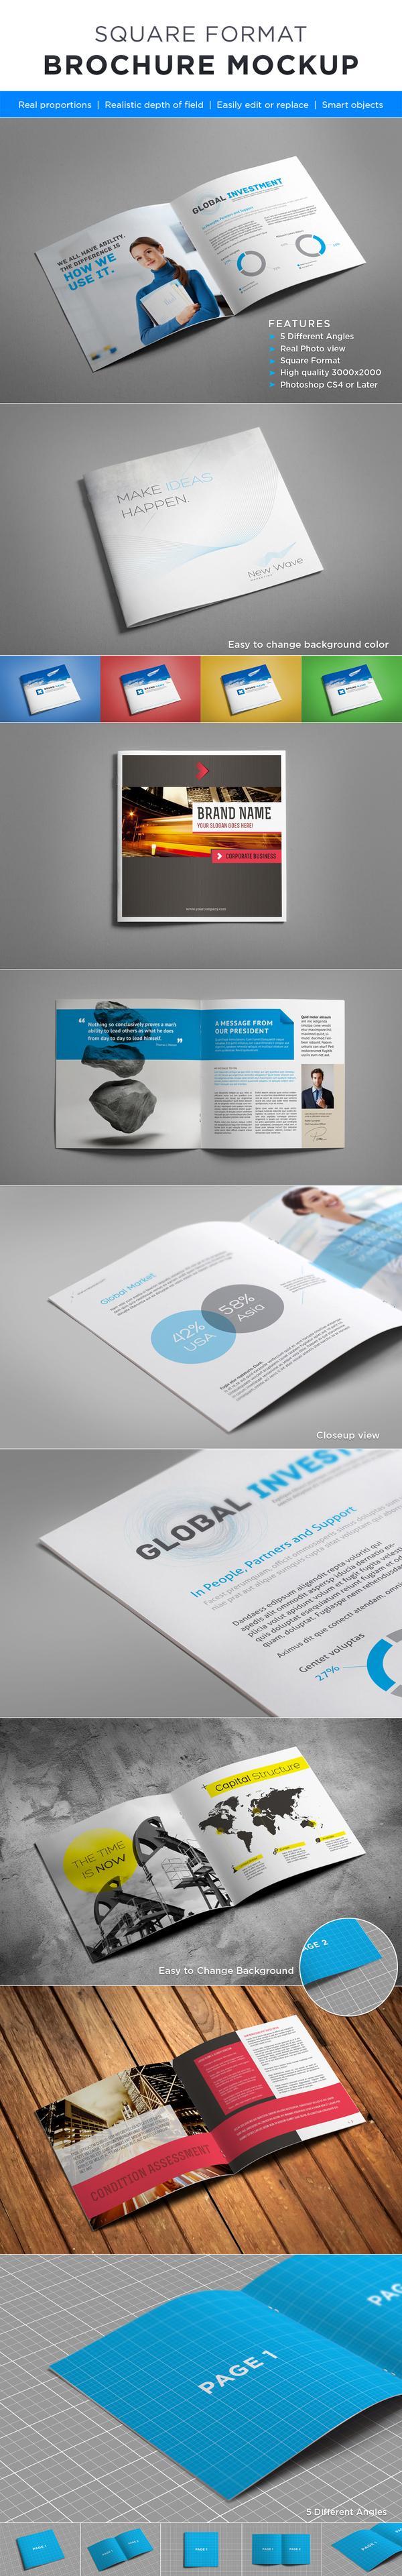 Desain Brosur Perusahaan - Brosur-Perusahaan-Square-Brochure-Mock-up-1